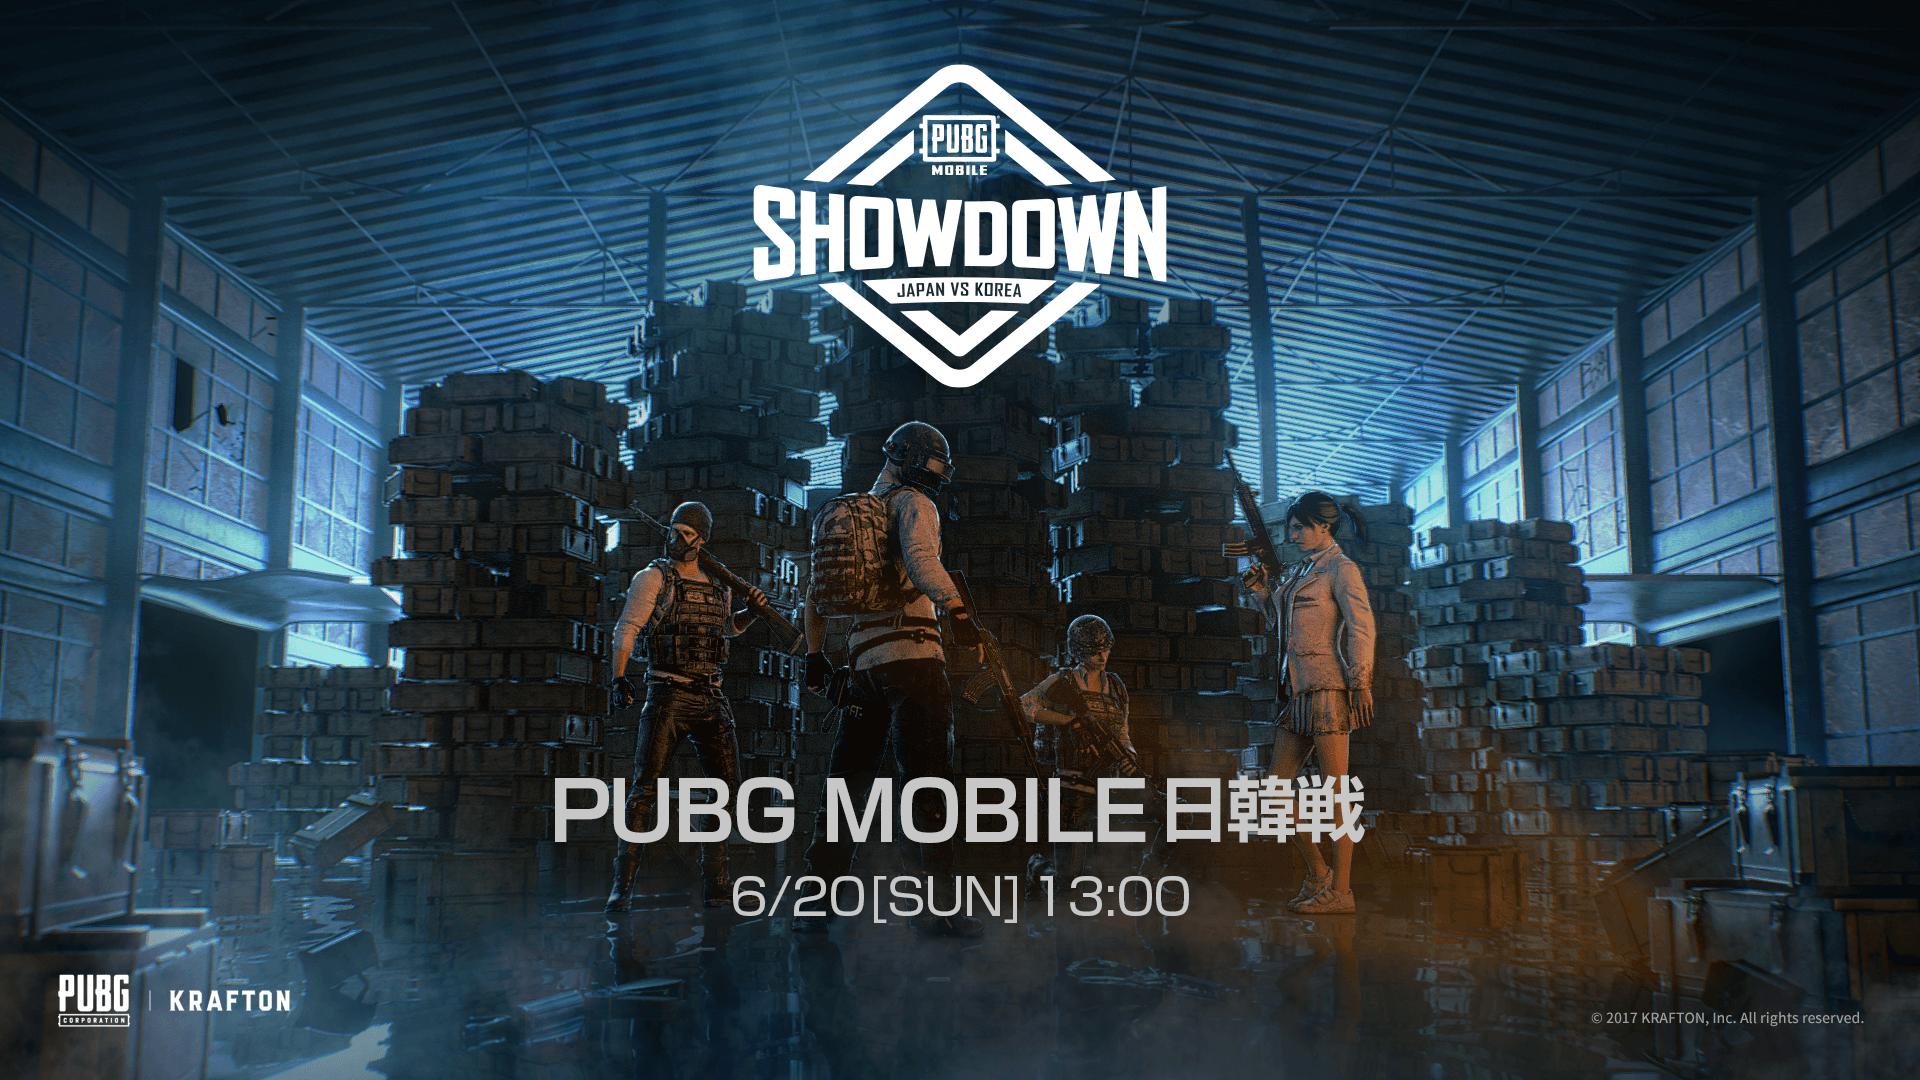 【 PUBG MOBILE部門 】『PUBG MOBILE SHOWDOWN:JAPAN VS KOREA』出場